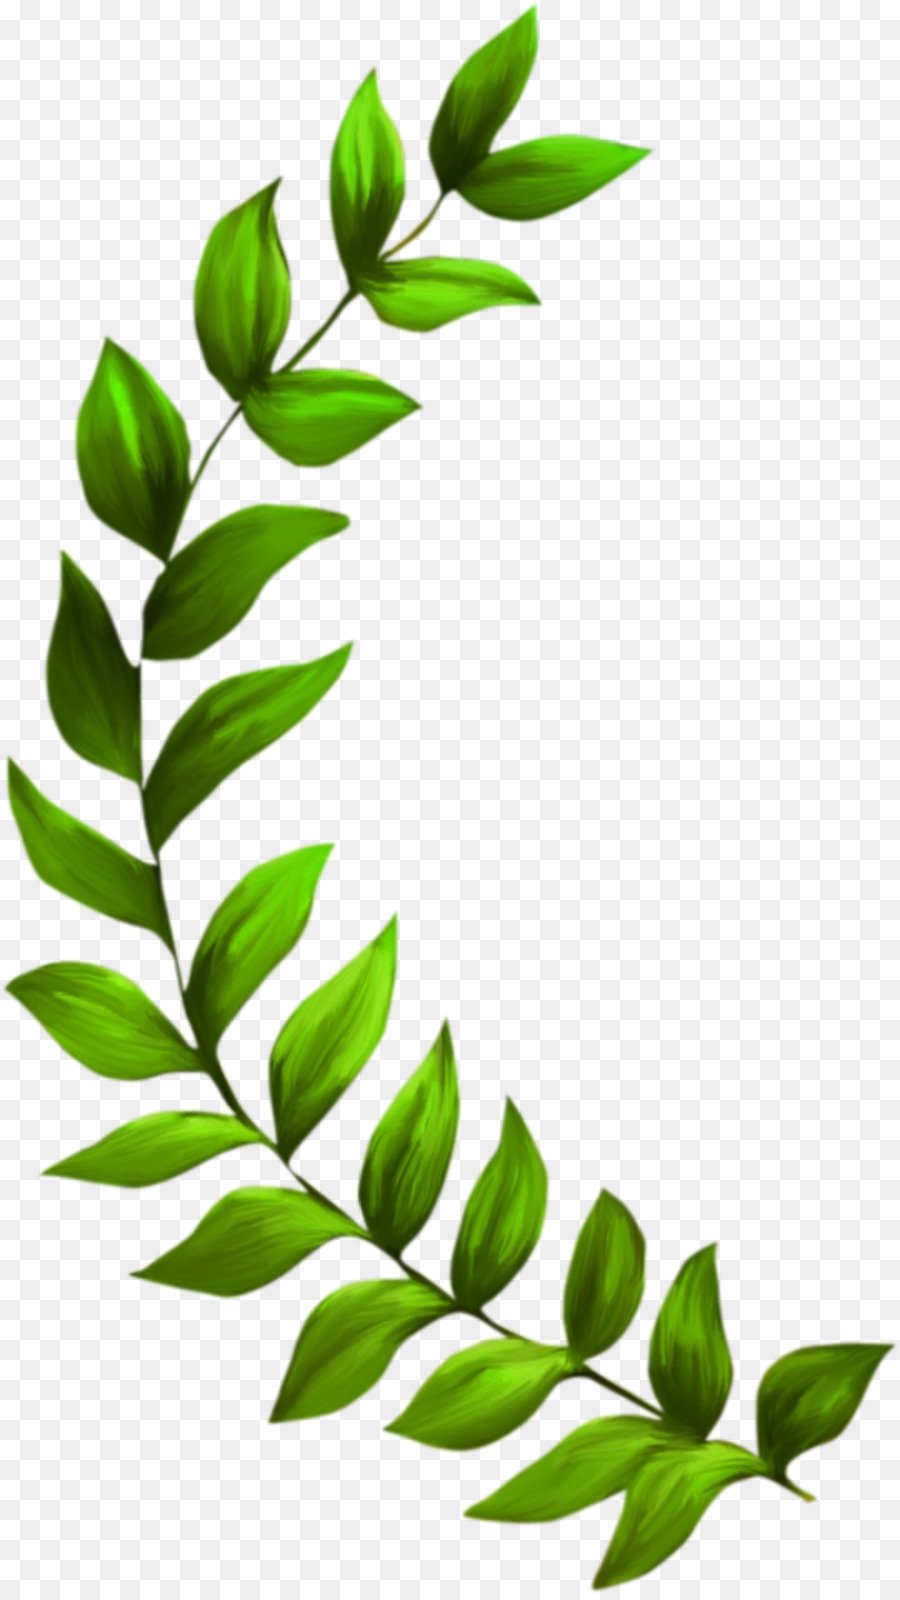 Algae clipart seagrass. Plant seaweed clip art